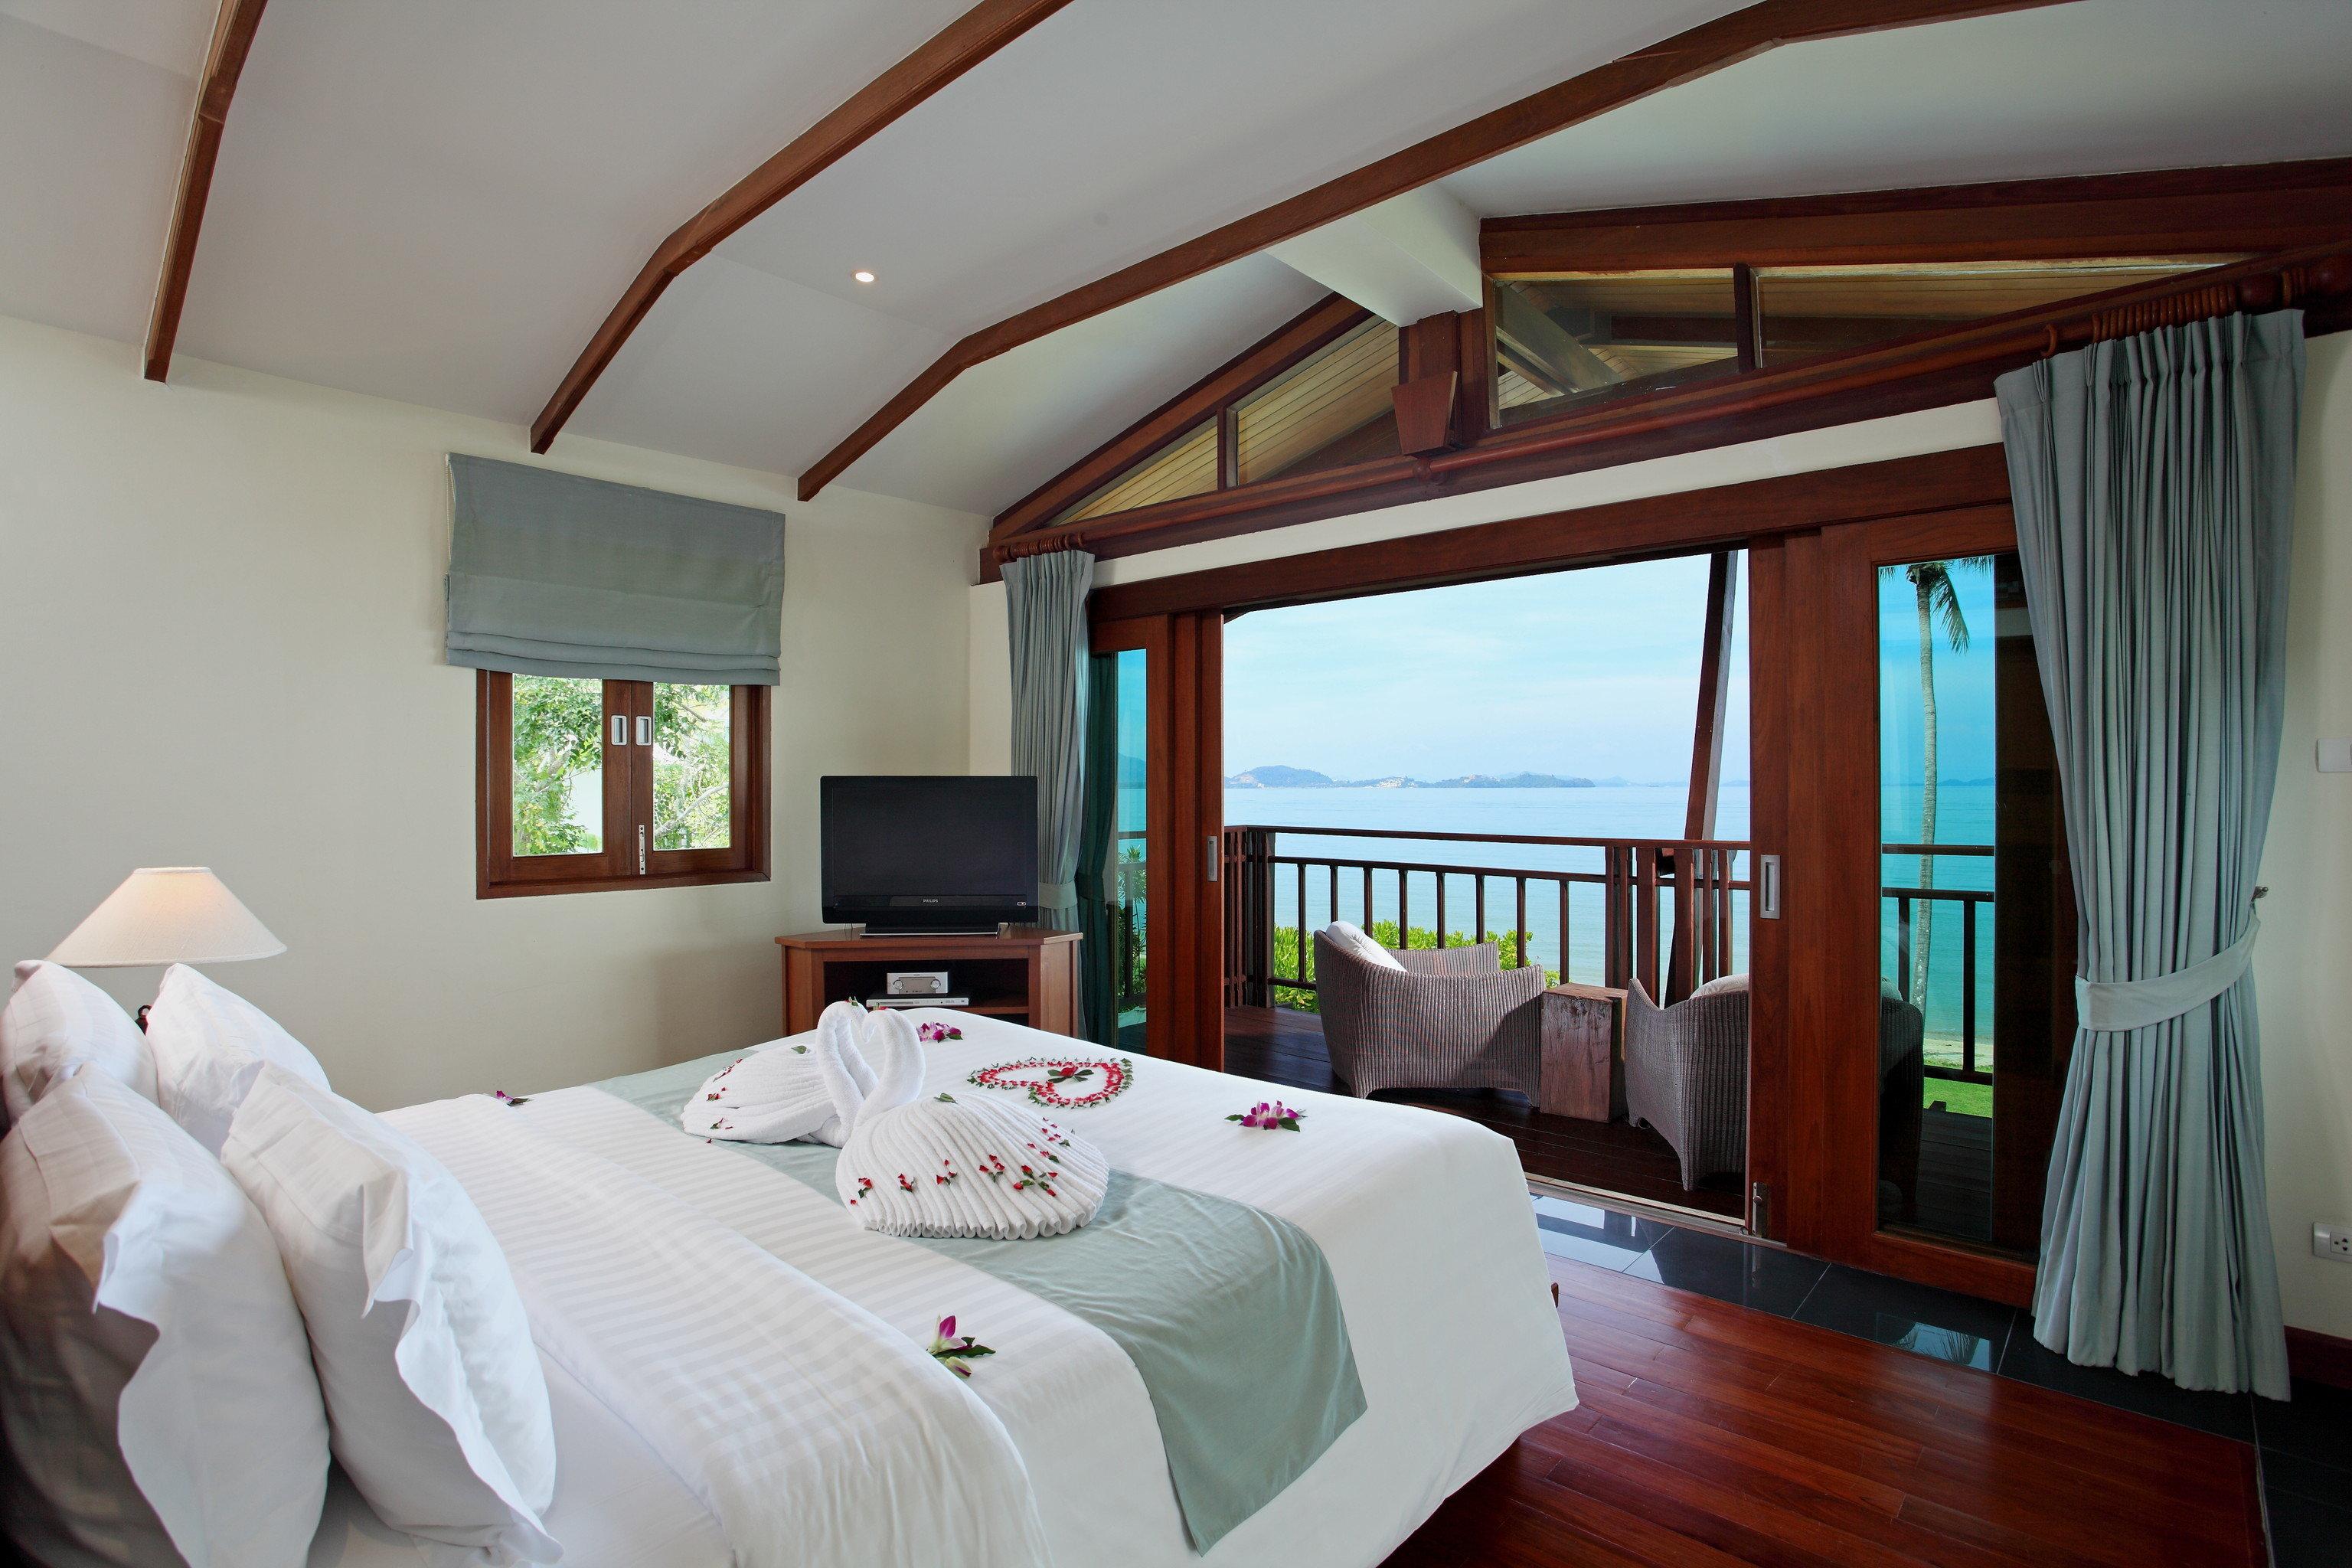 Beach Hotels Phuket Thailand indoor bed wall room floor Bedroom hotel ceiling Suite interior design pillow real estate estate window boarding house Resort wood furniture